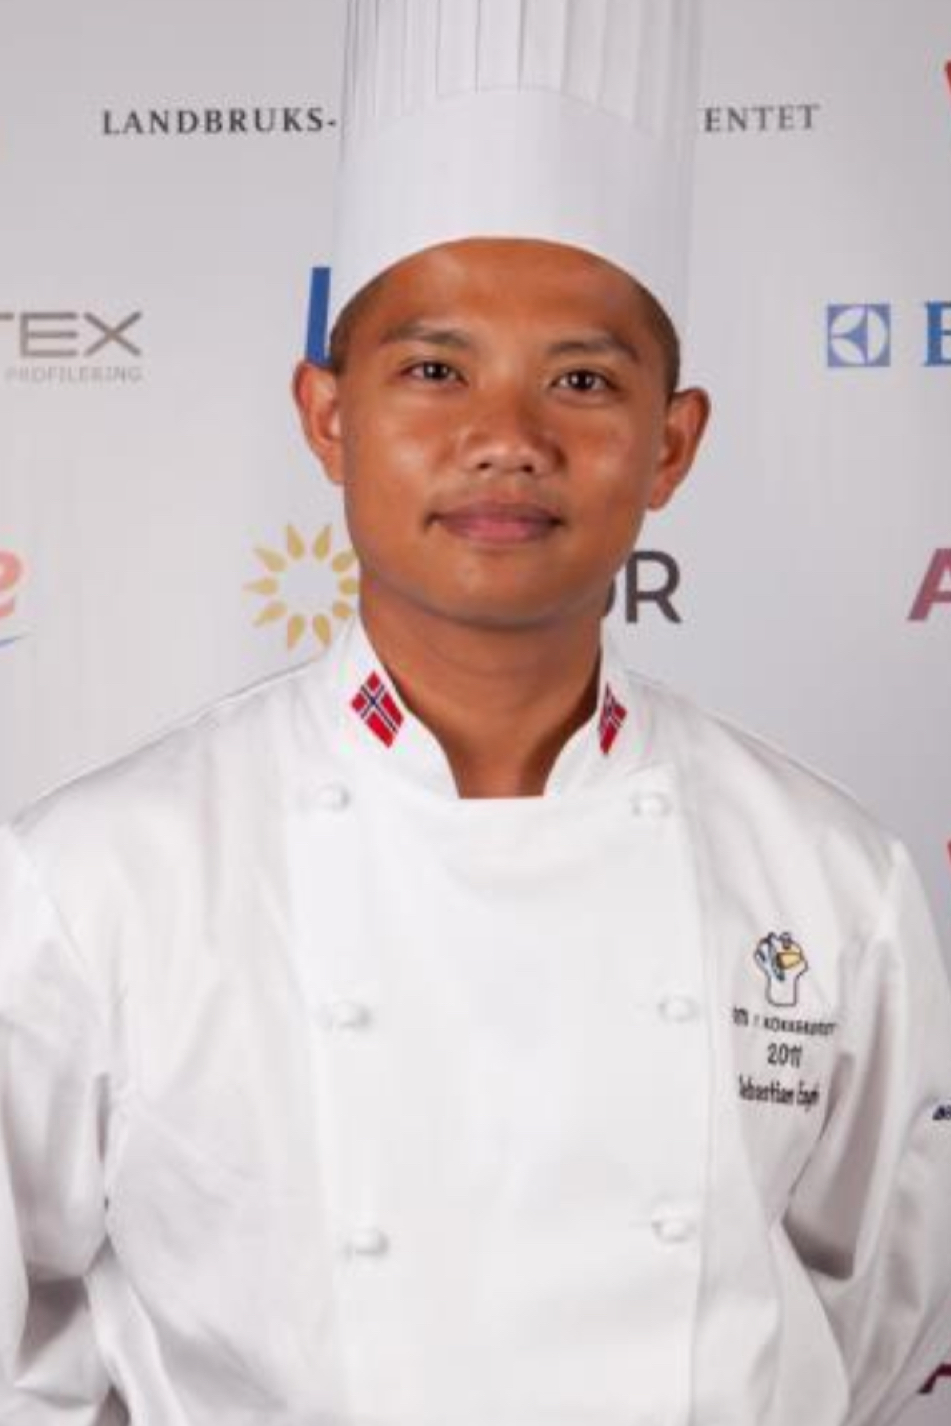 Sebastian Engh